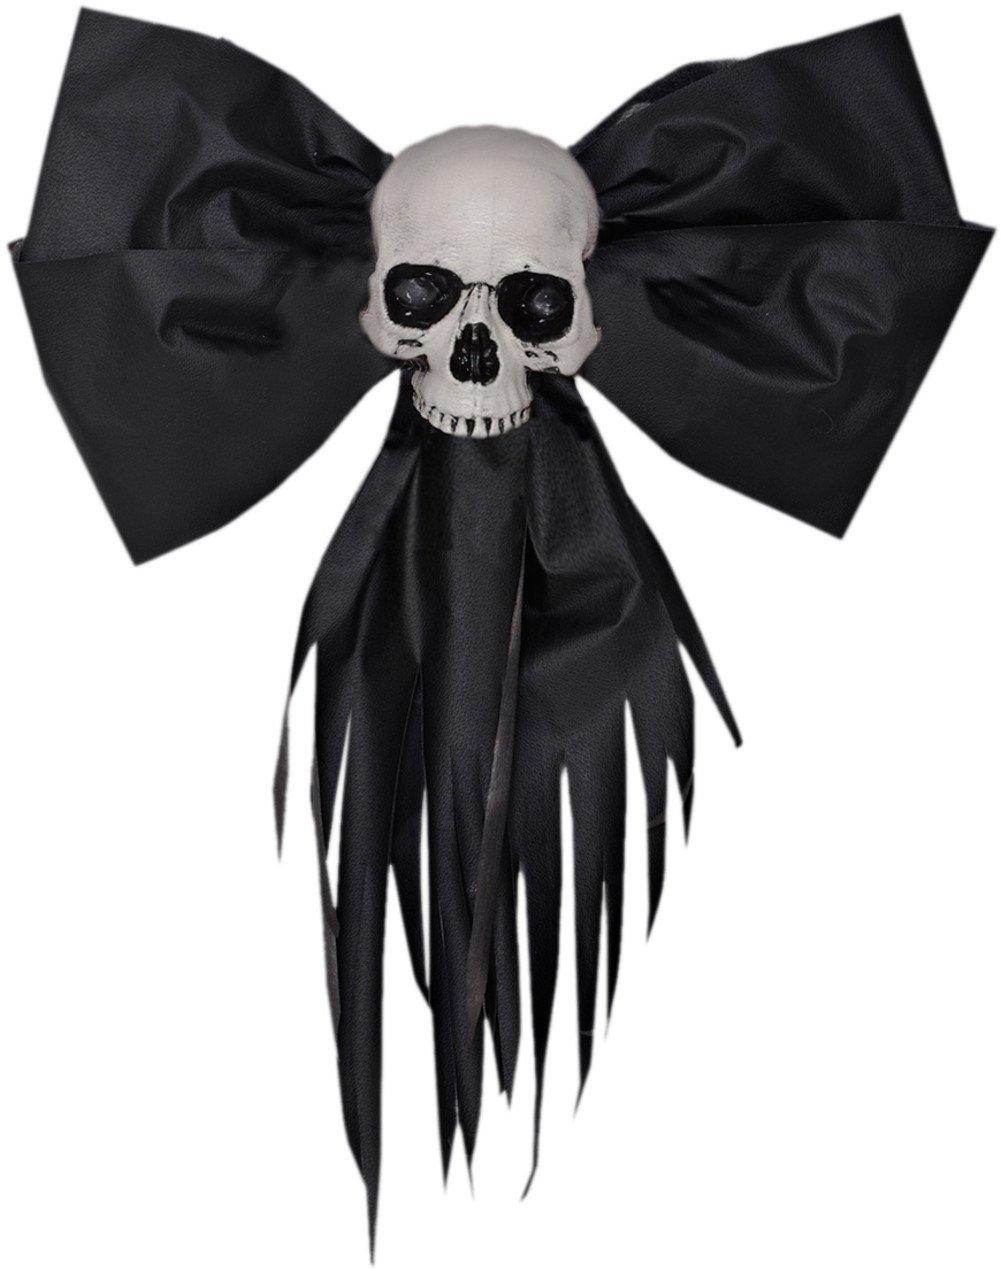 Large Black Skull Creepmas Bow Wall Door Christmas Halloween Decoration